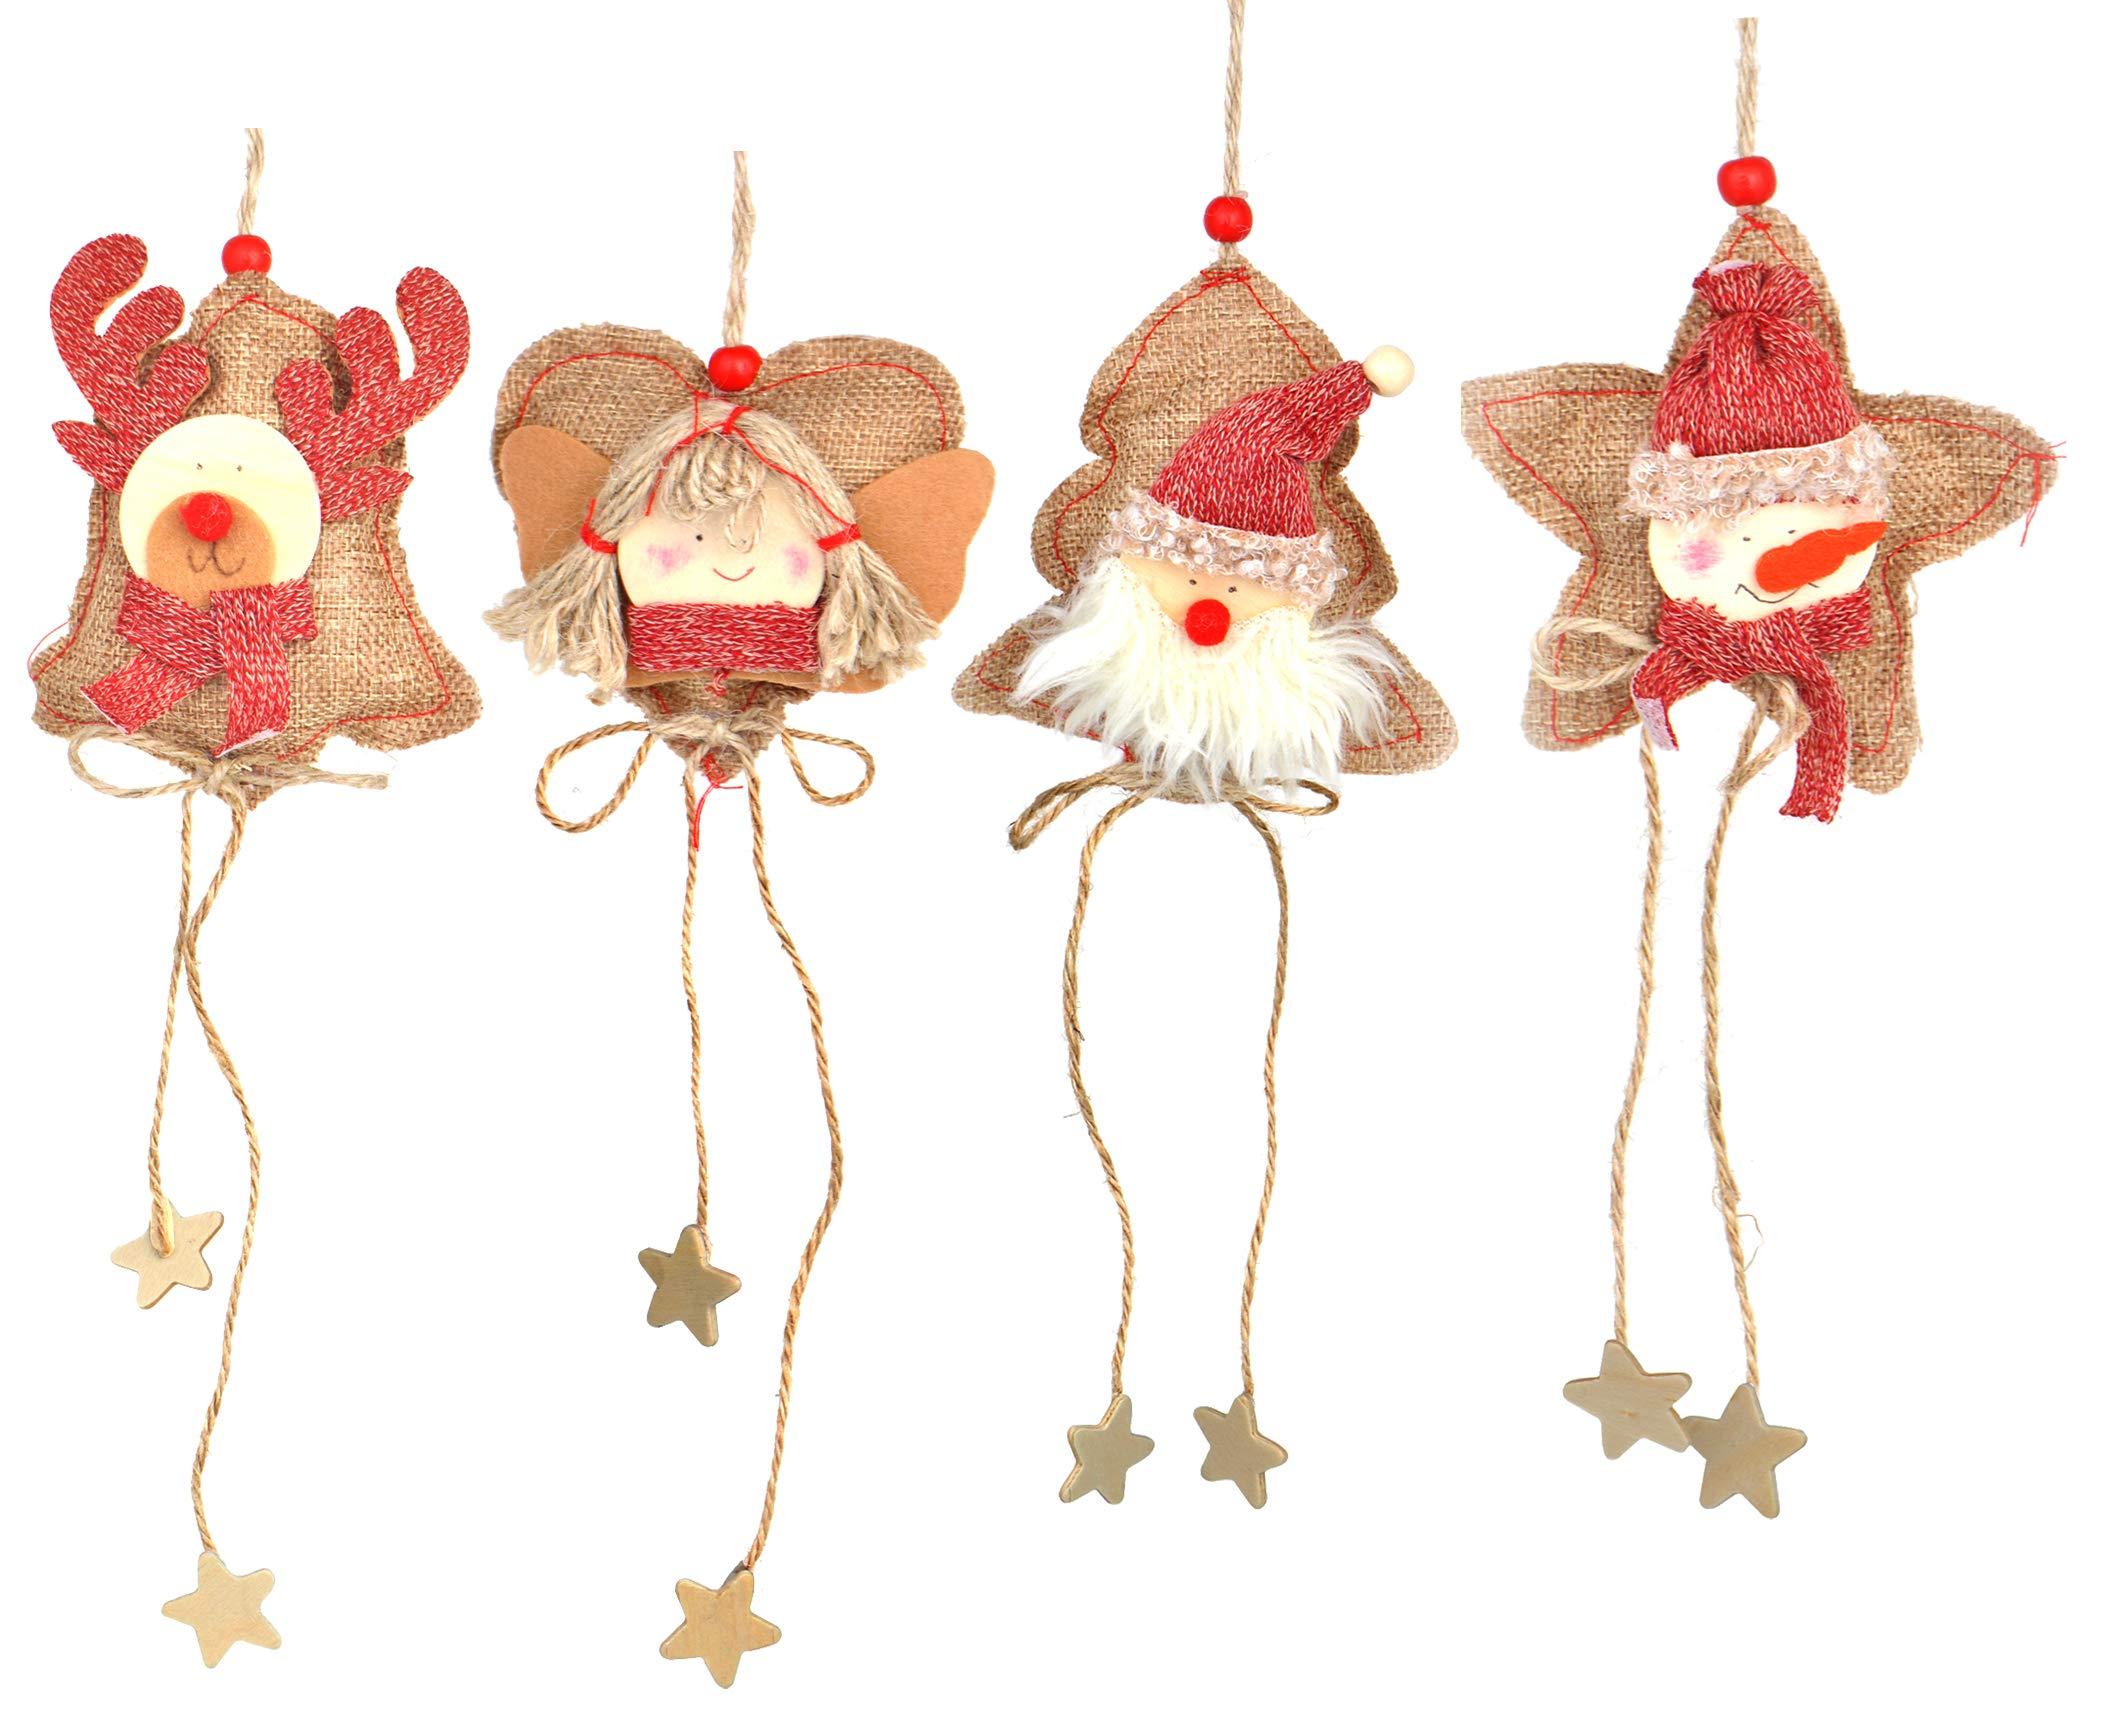 Love Wind Hanging Heart Christmas Home Decor 8pcs Rustic Burlap Moose/Snowman/Santa Claus/Bell